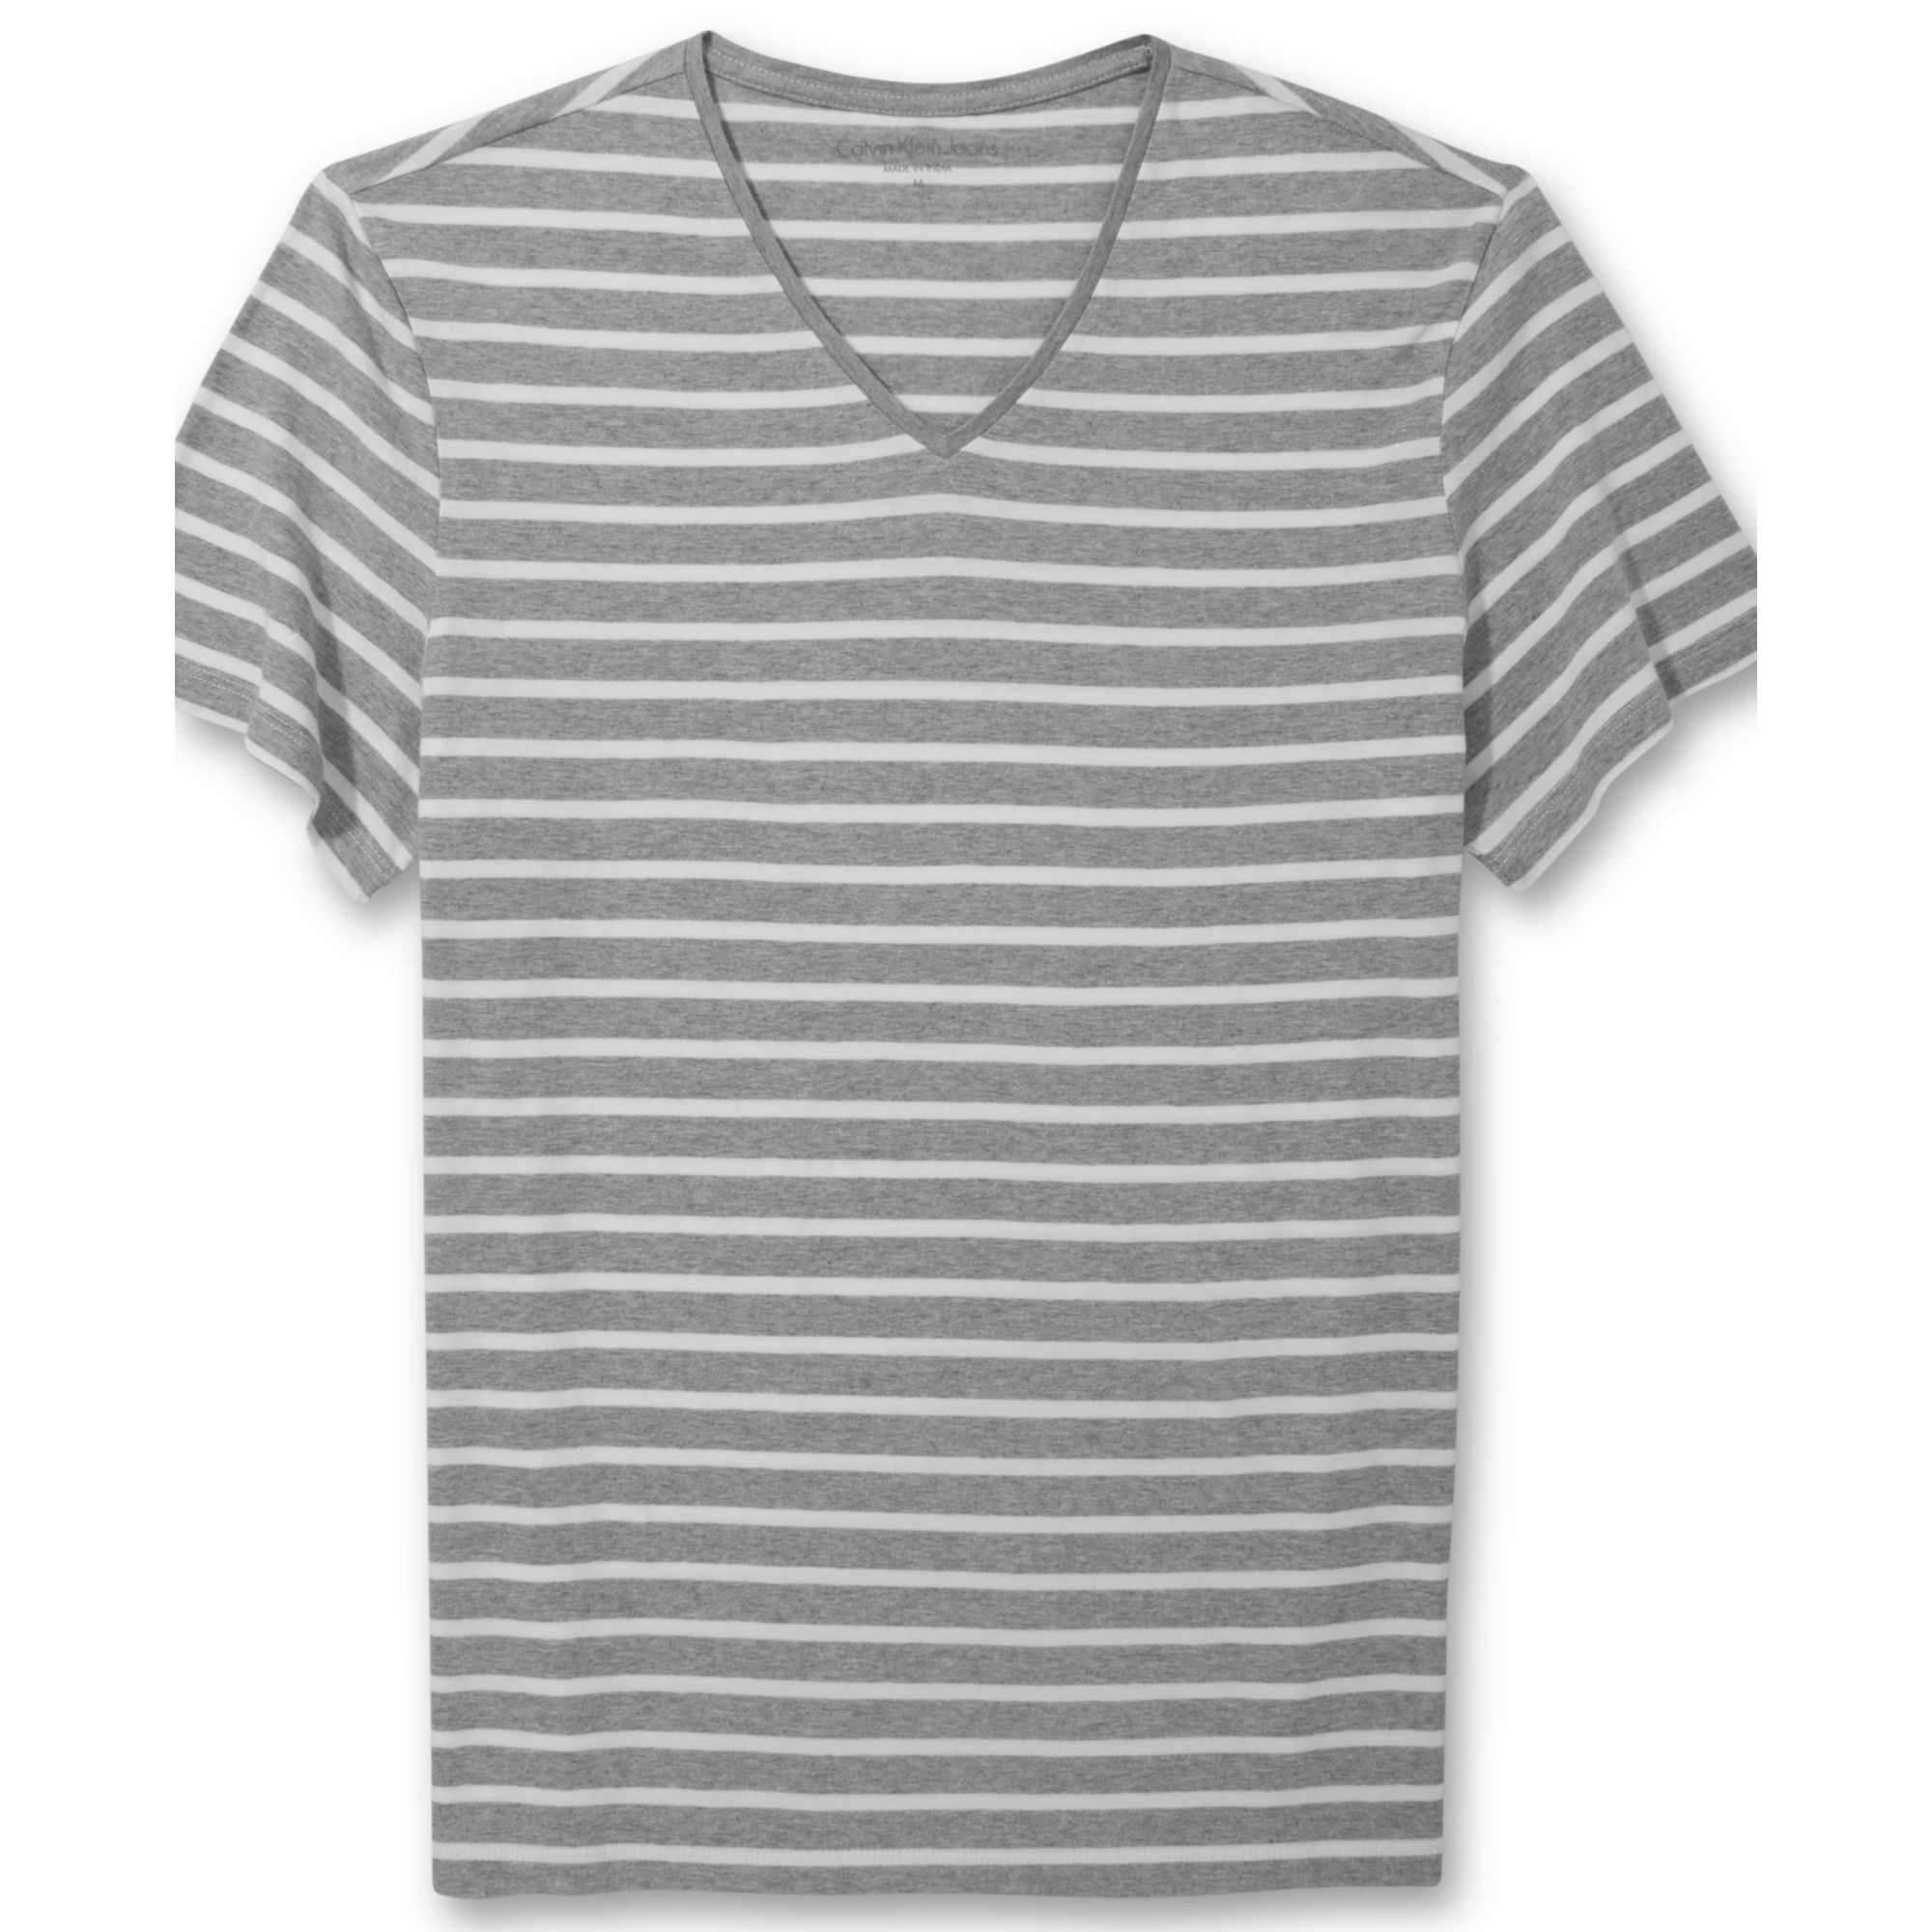 83df1d2ec51f Calvin Klein Striped Vneck Tshirt in Gray for Men - Lyst